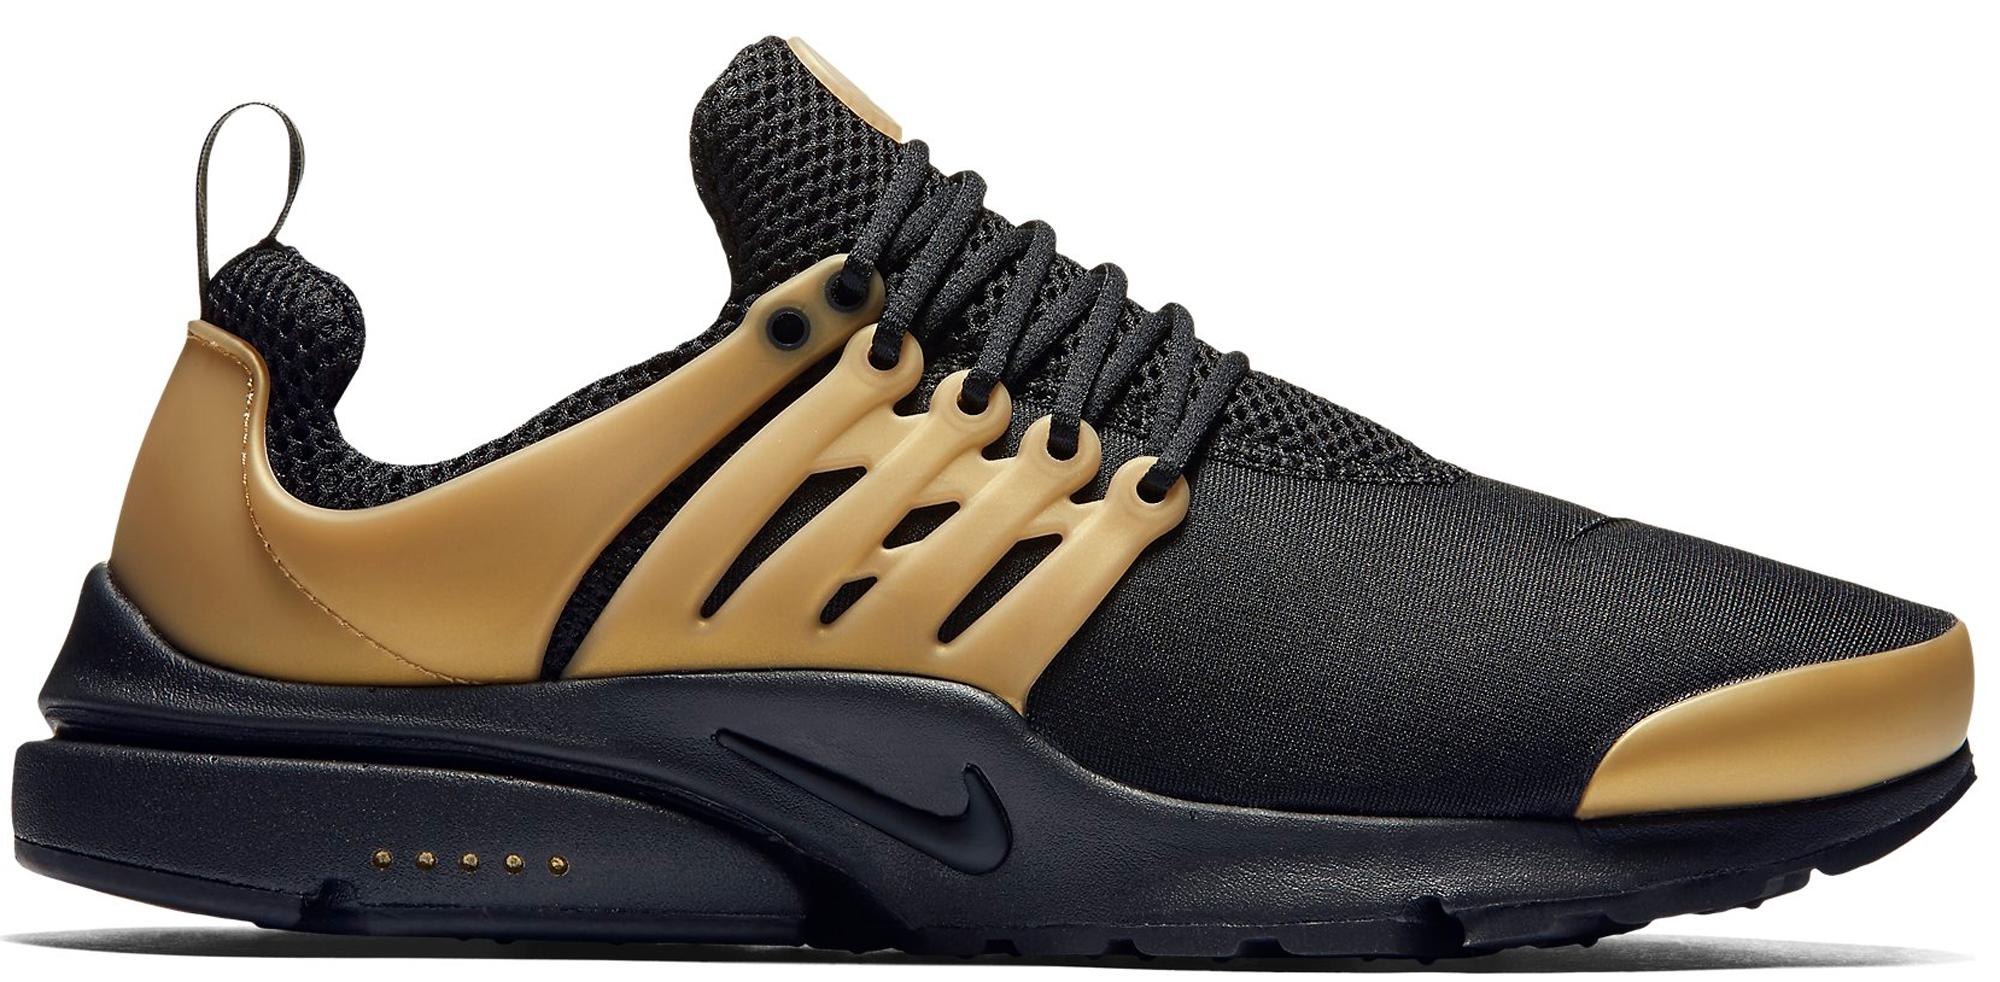 Nike Air Presto Black Metallic Gold